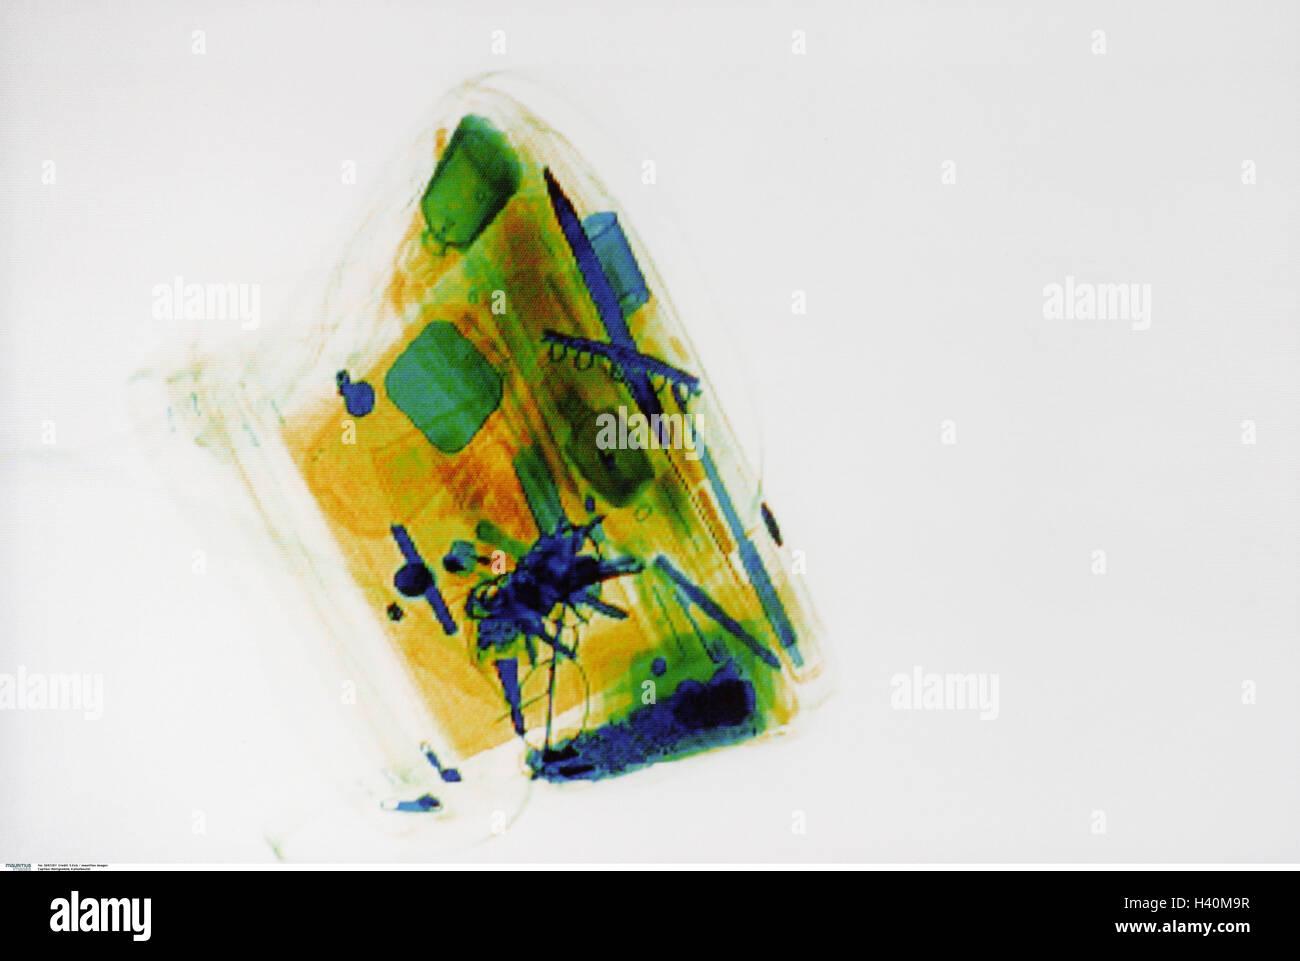 647b697819 Ewa Lagan Louis Vuitton Horizon Culture Bag Damier Graphite